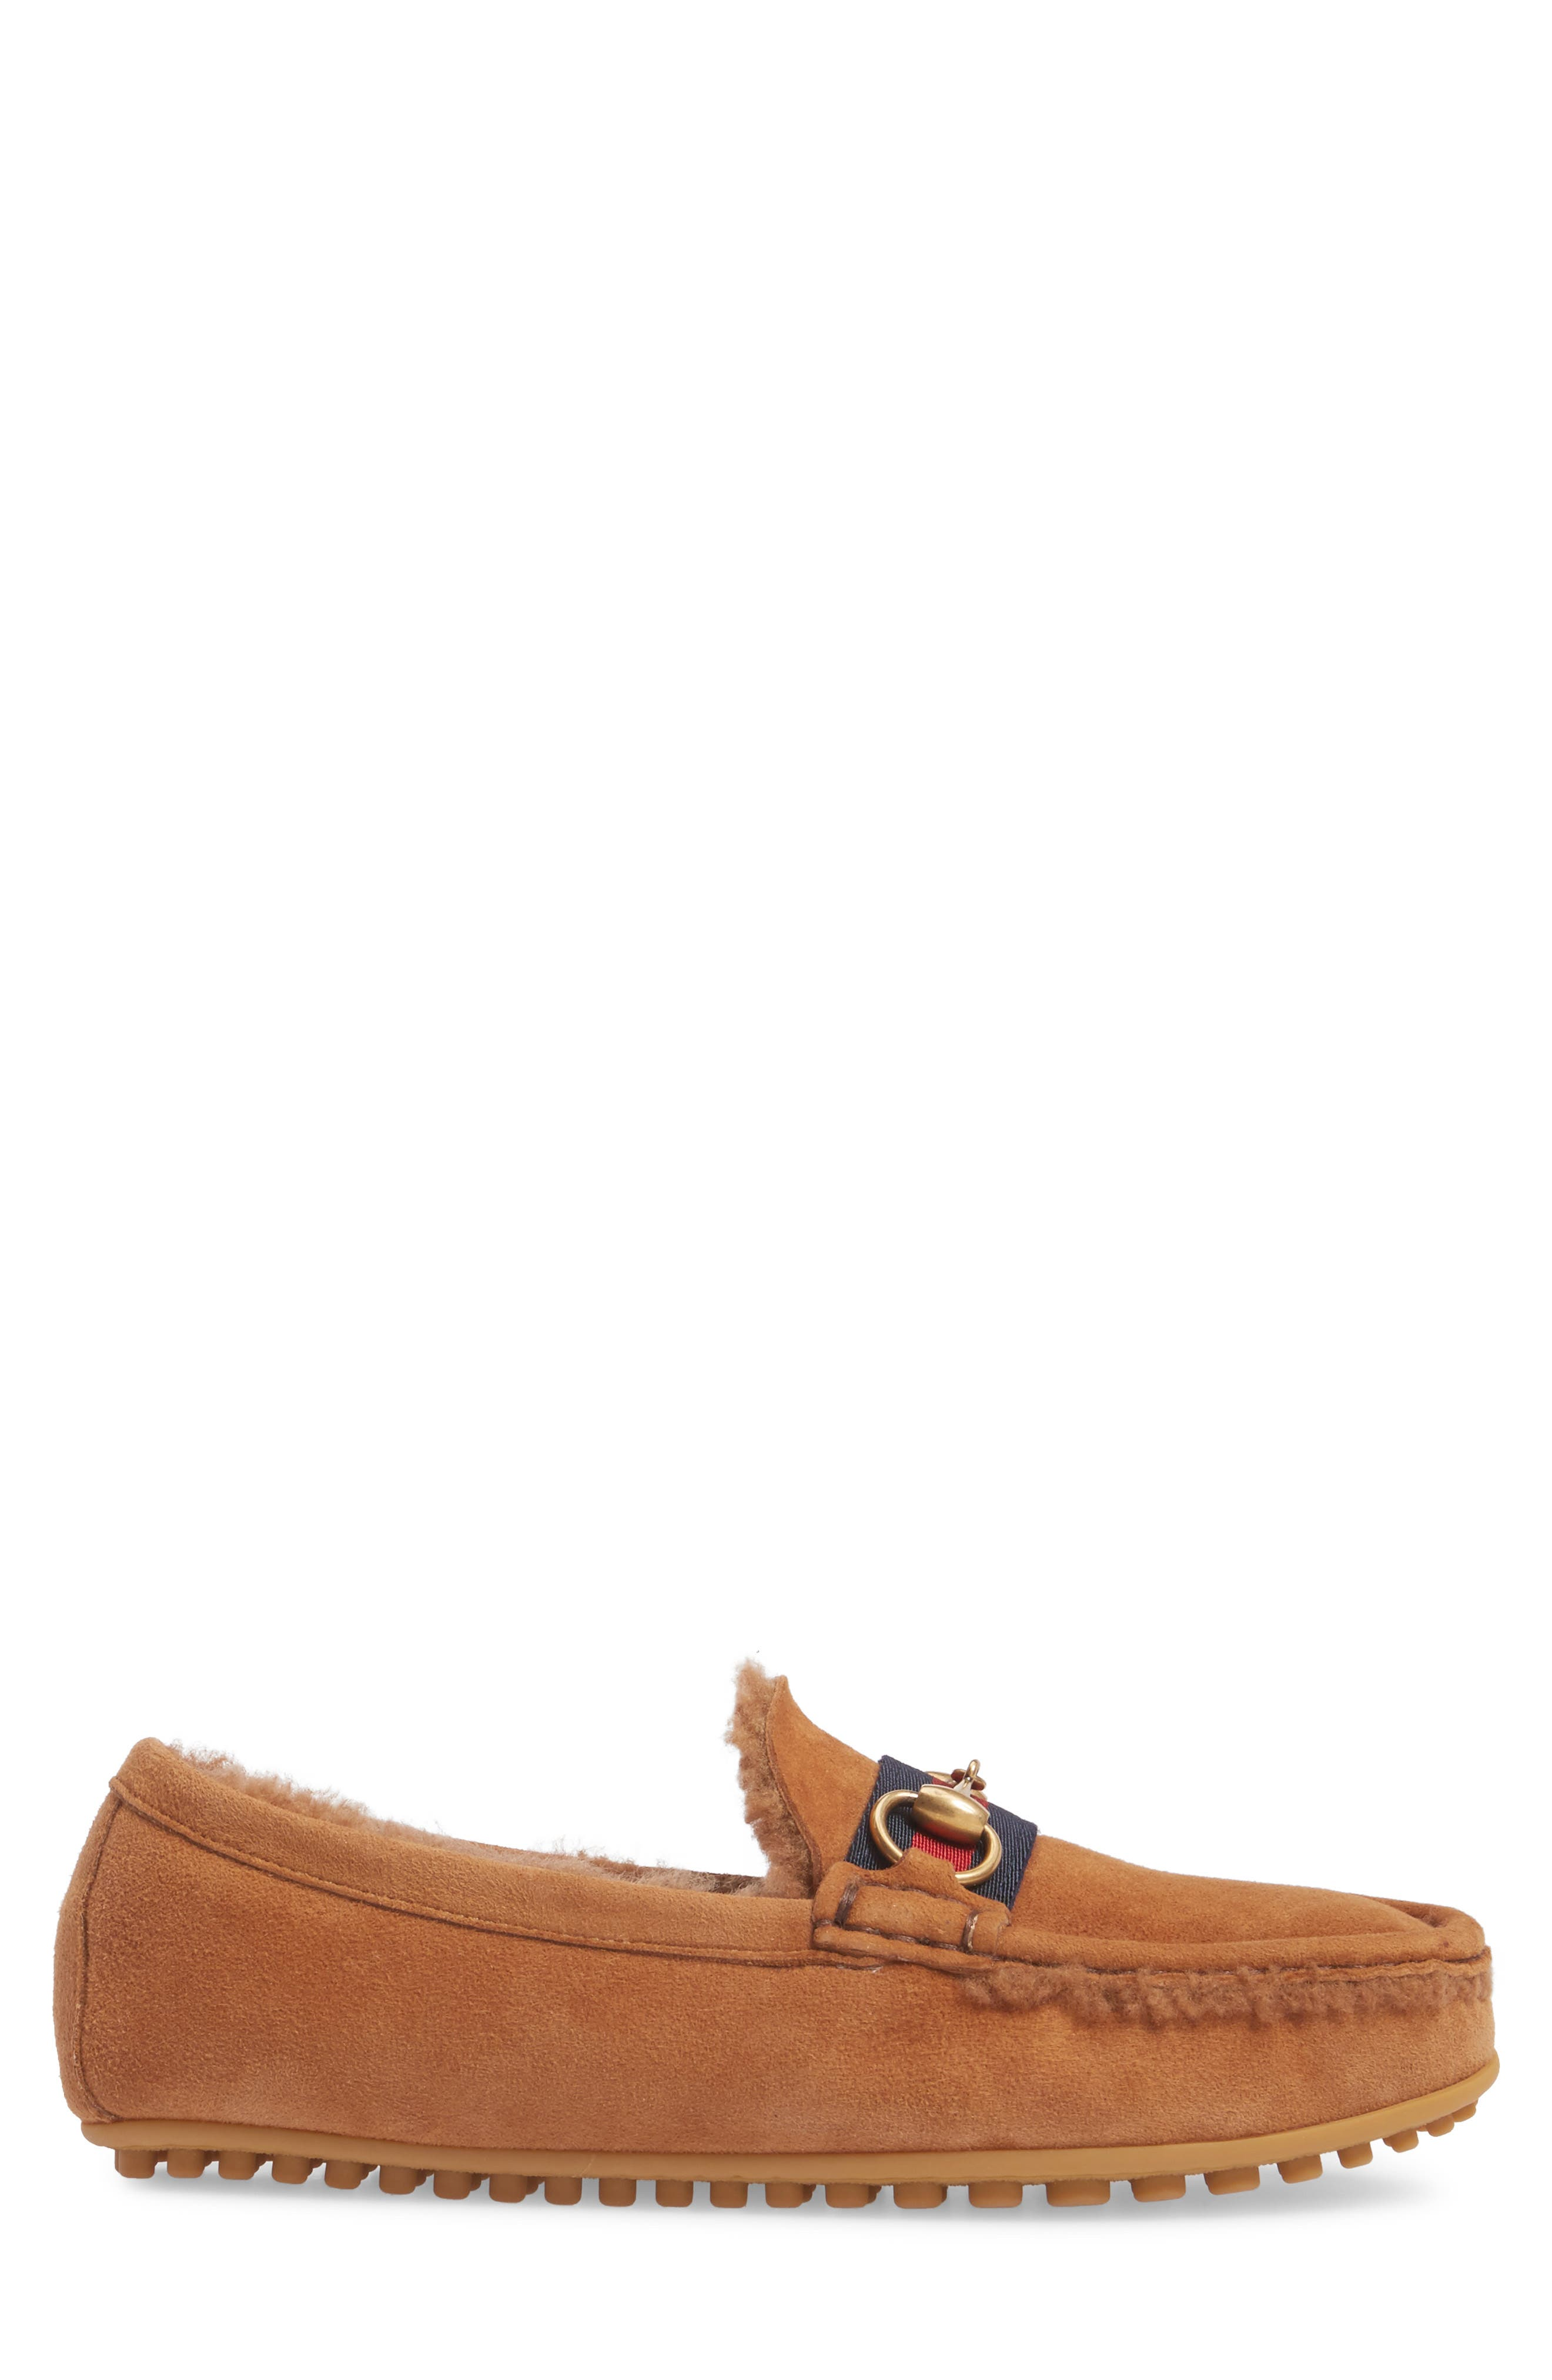 Driving Shoe with Genuine Shearling,                             Alternate thumbnail 3, color,                             Dark Tan